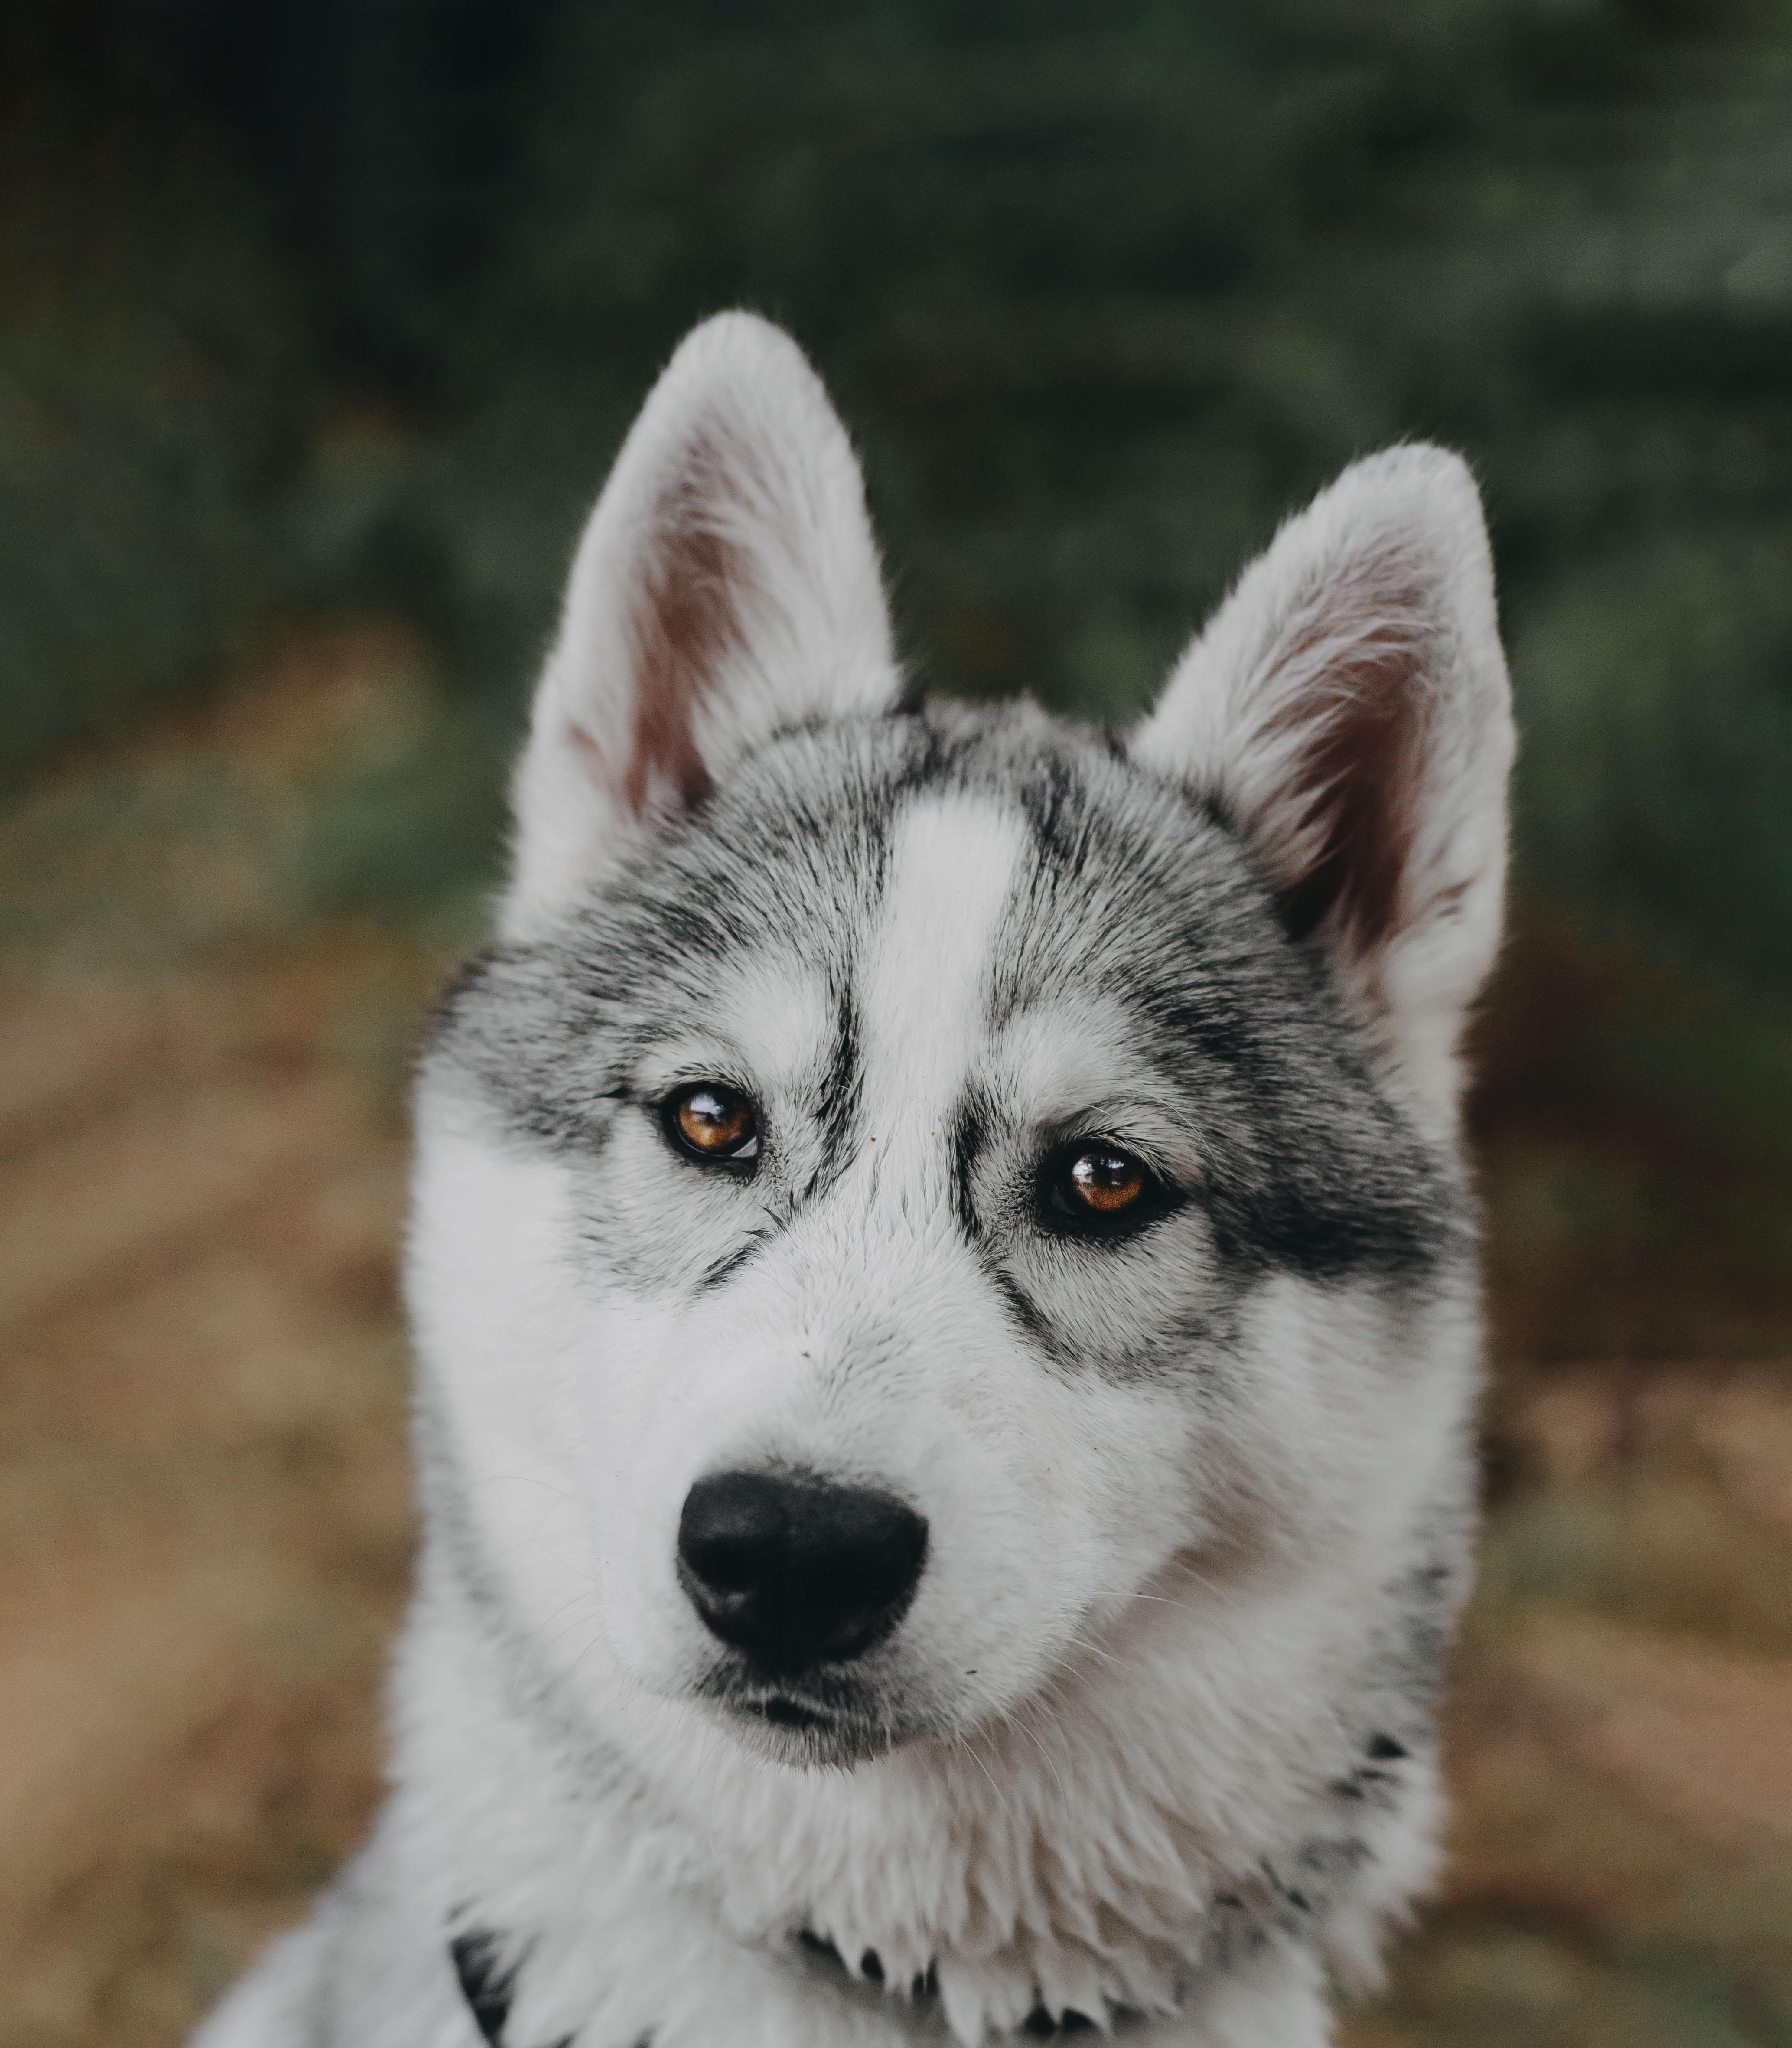 Meet My Dog Tsuki, The Siberian Husky With Goggles!